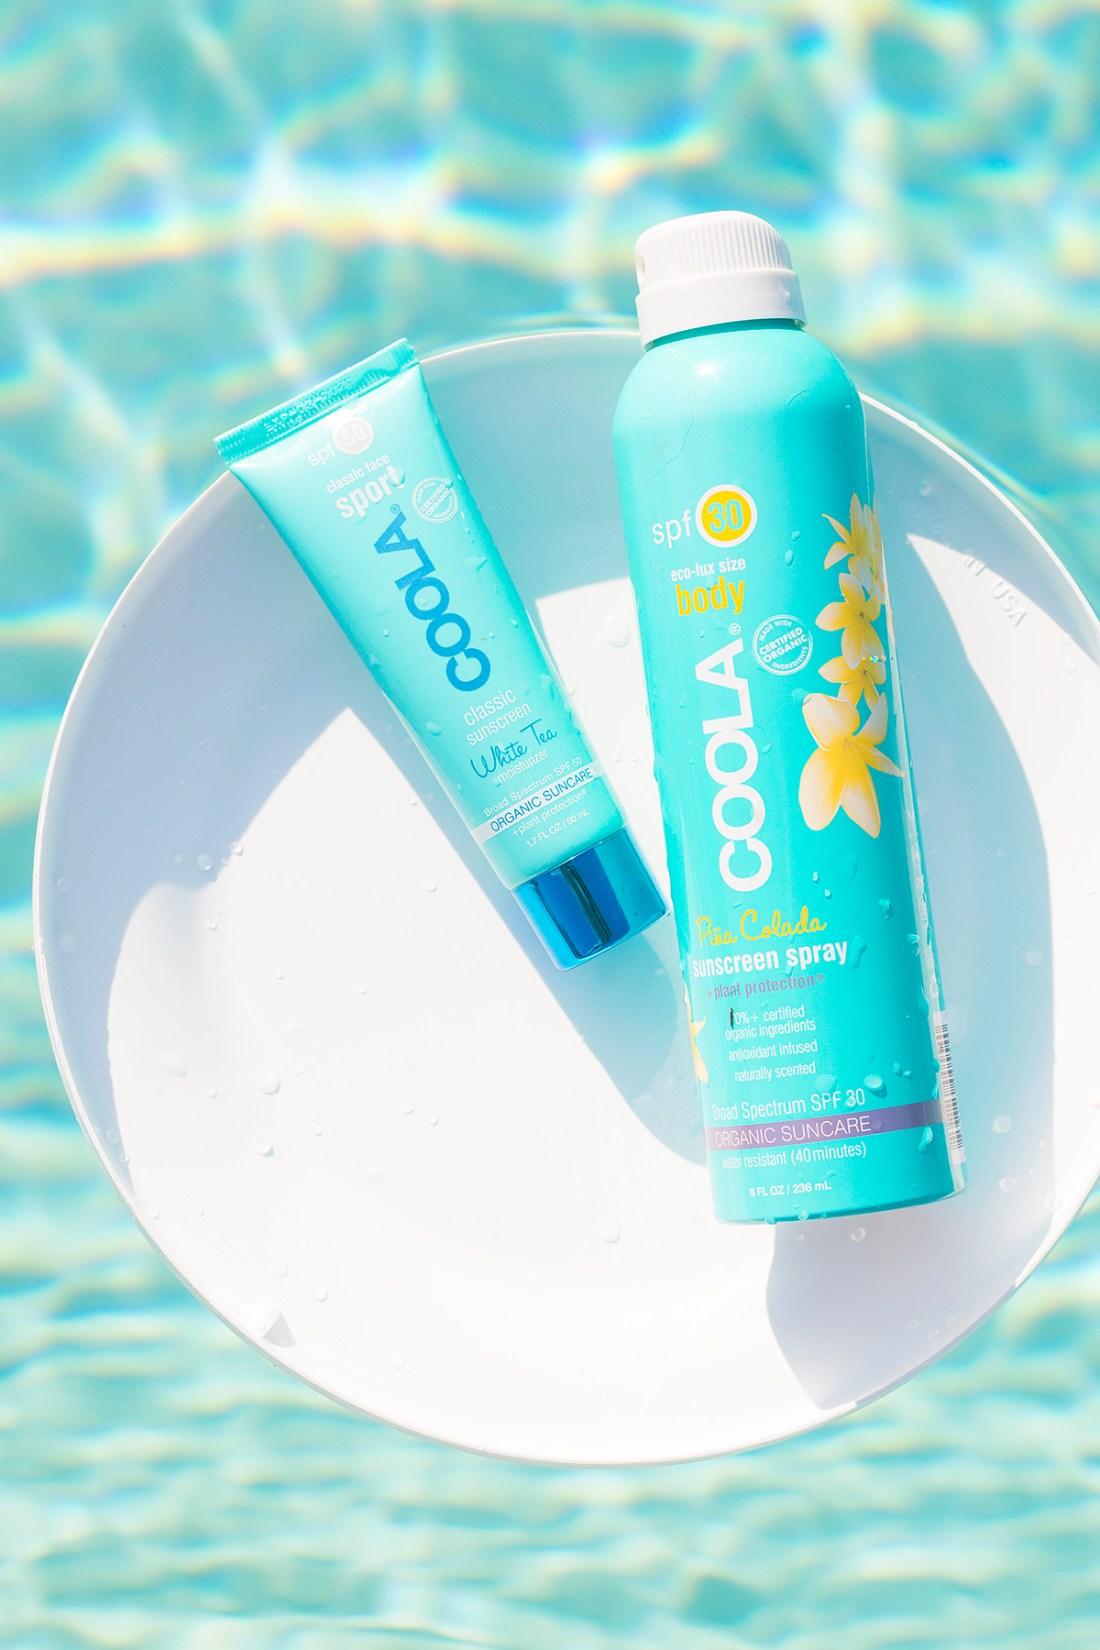 Summer Sunscreen Favorites: COOLA Organic Sunscreens